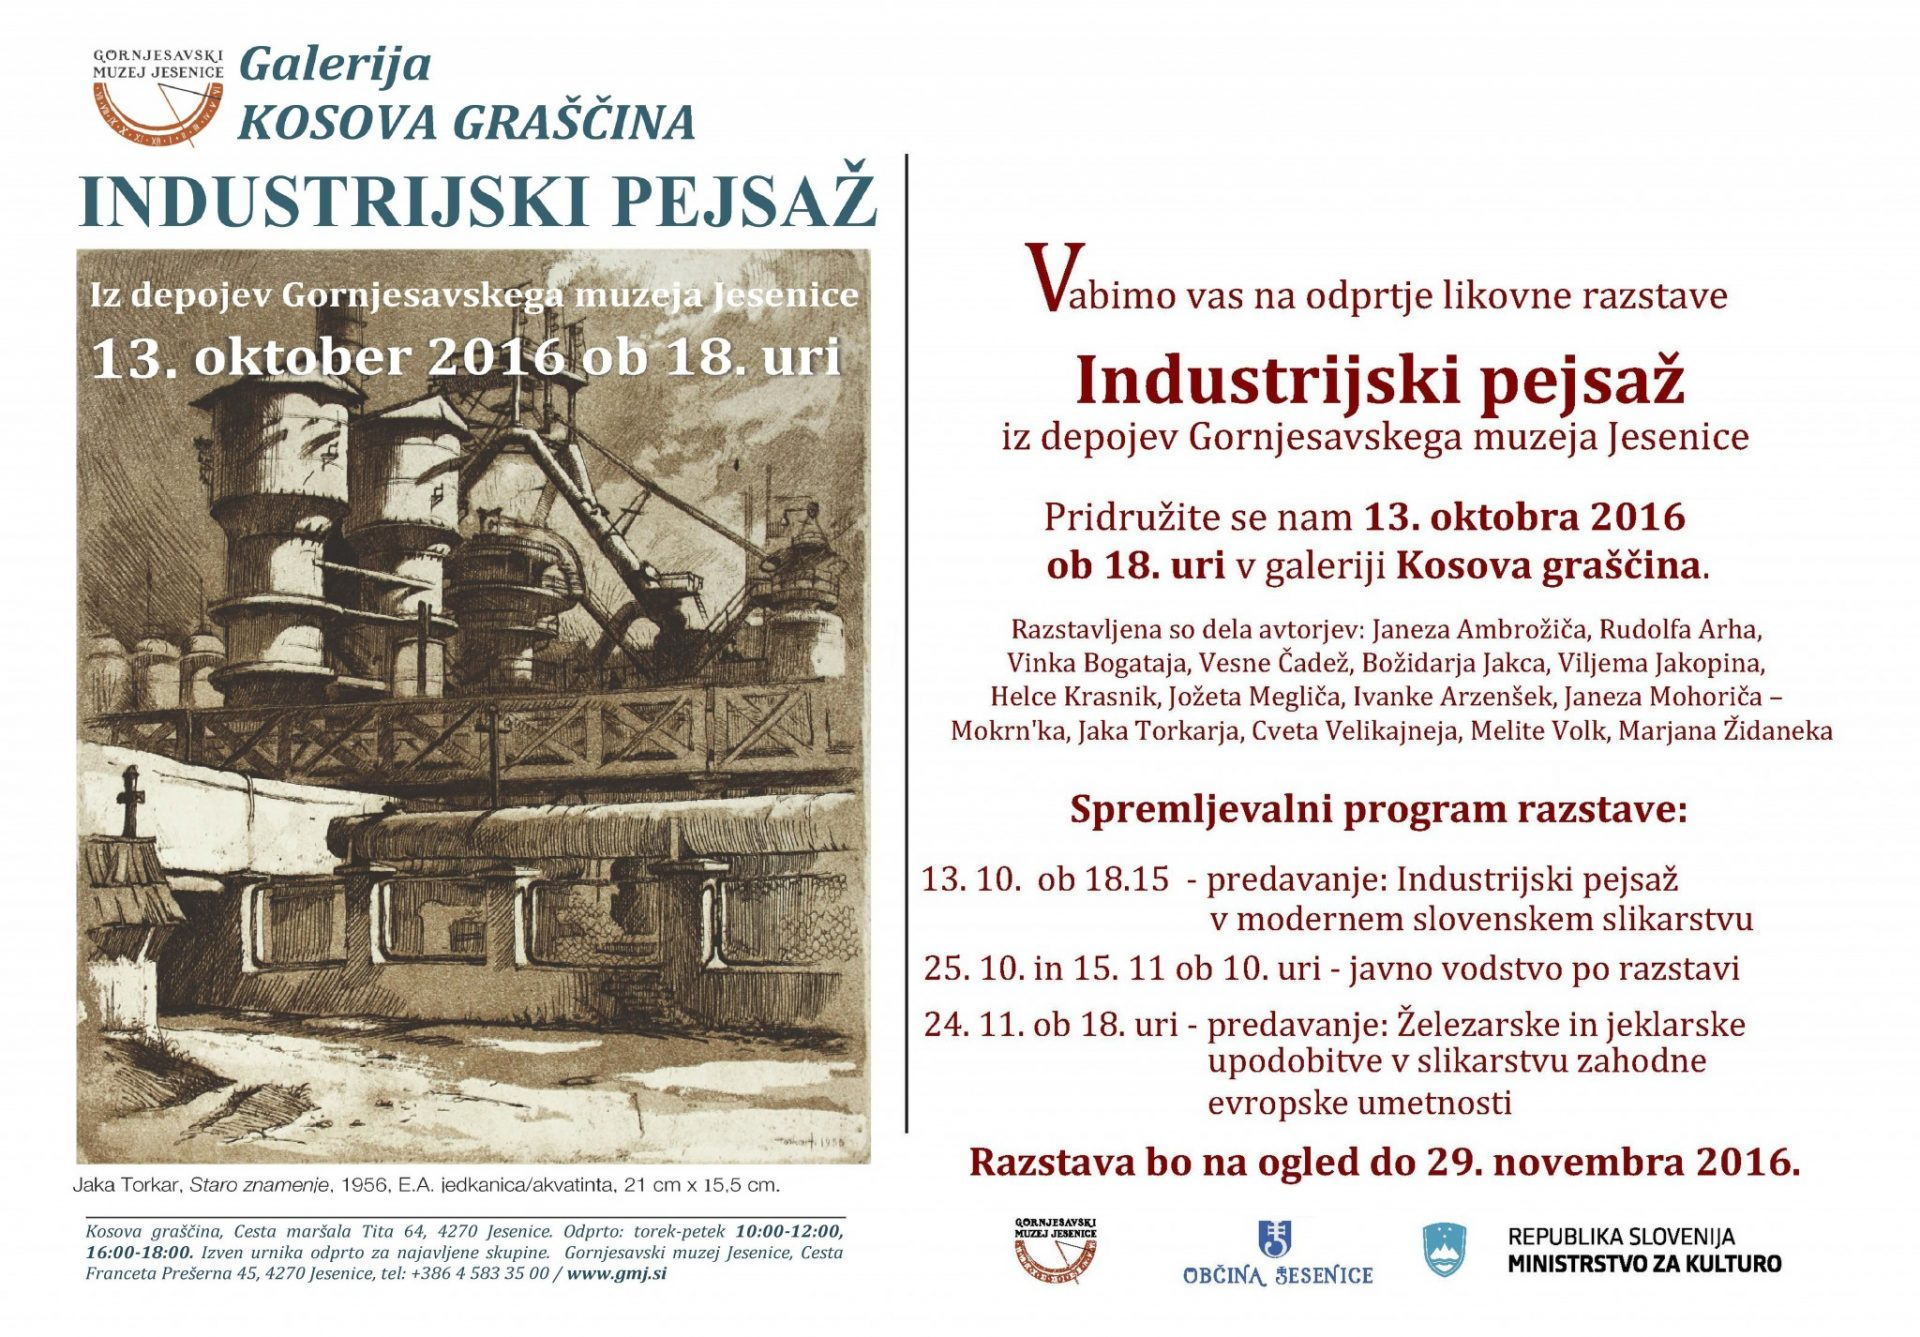 Aljaž Pogačnik, Kosova graščina, Jesenice, Gornjesavski muzej,